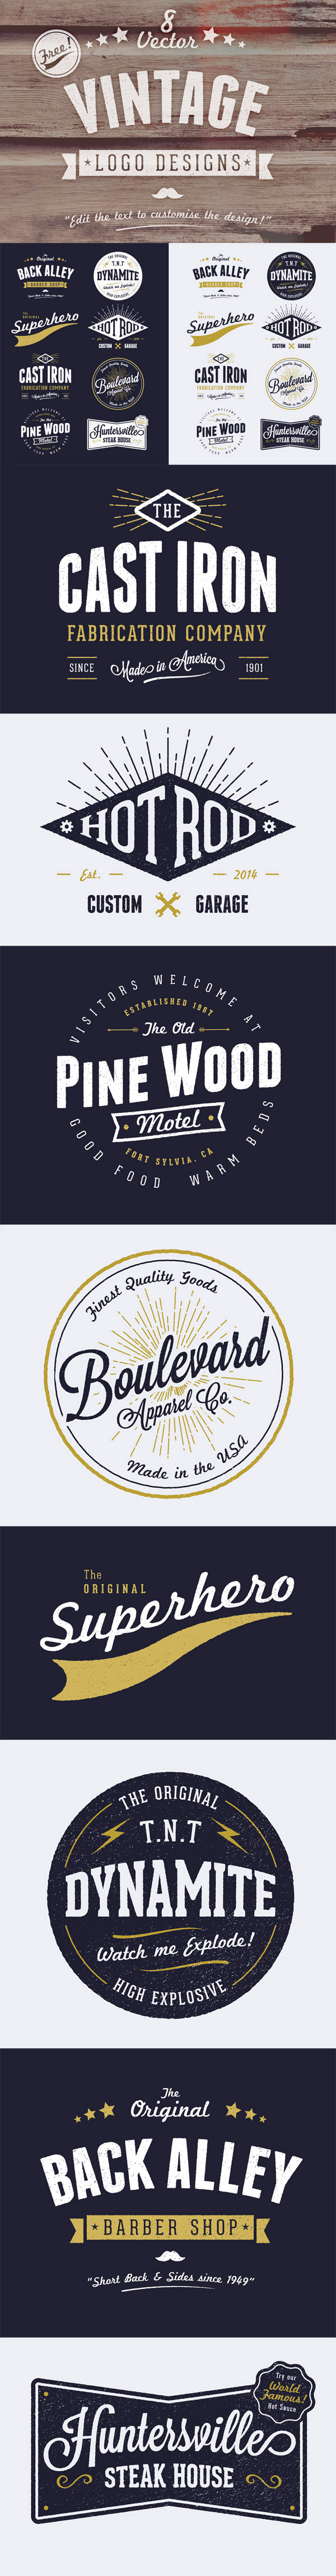 vintage-logo-designs